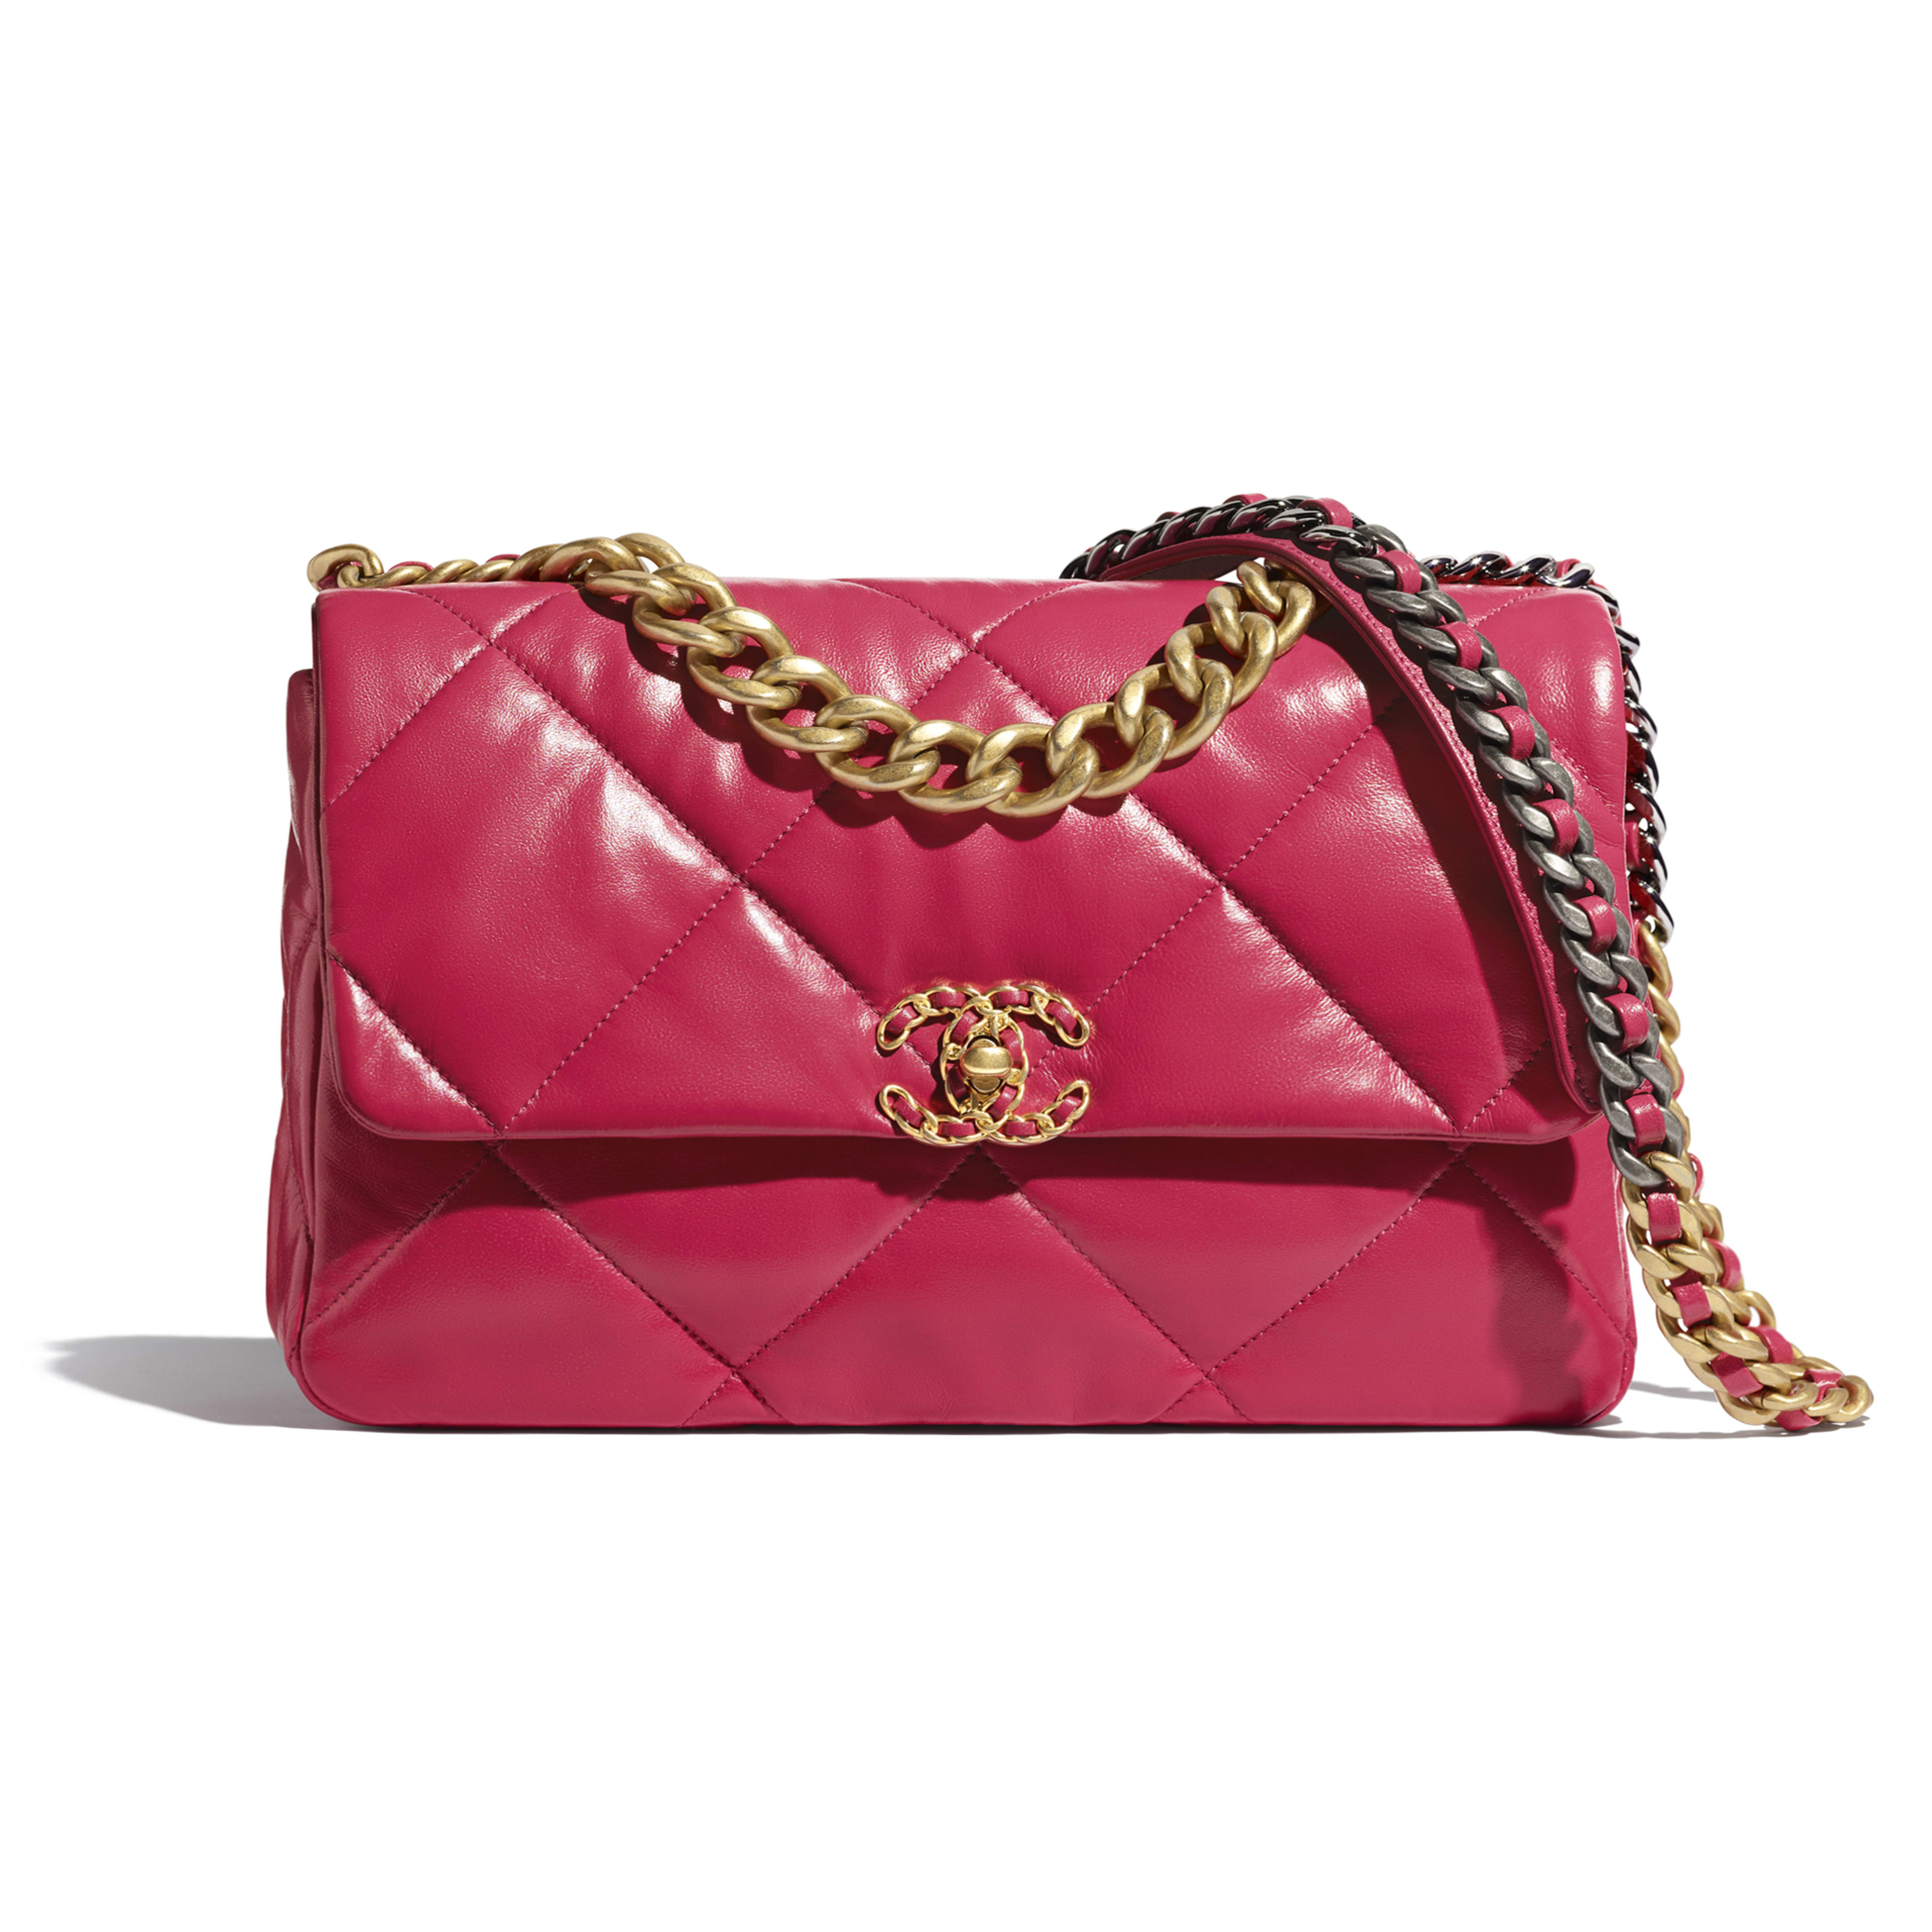 Chanel 19 Large Flap Bag Lambskin Gold